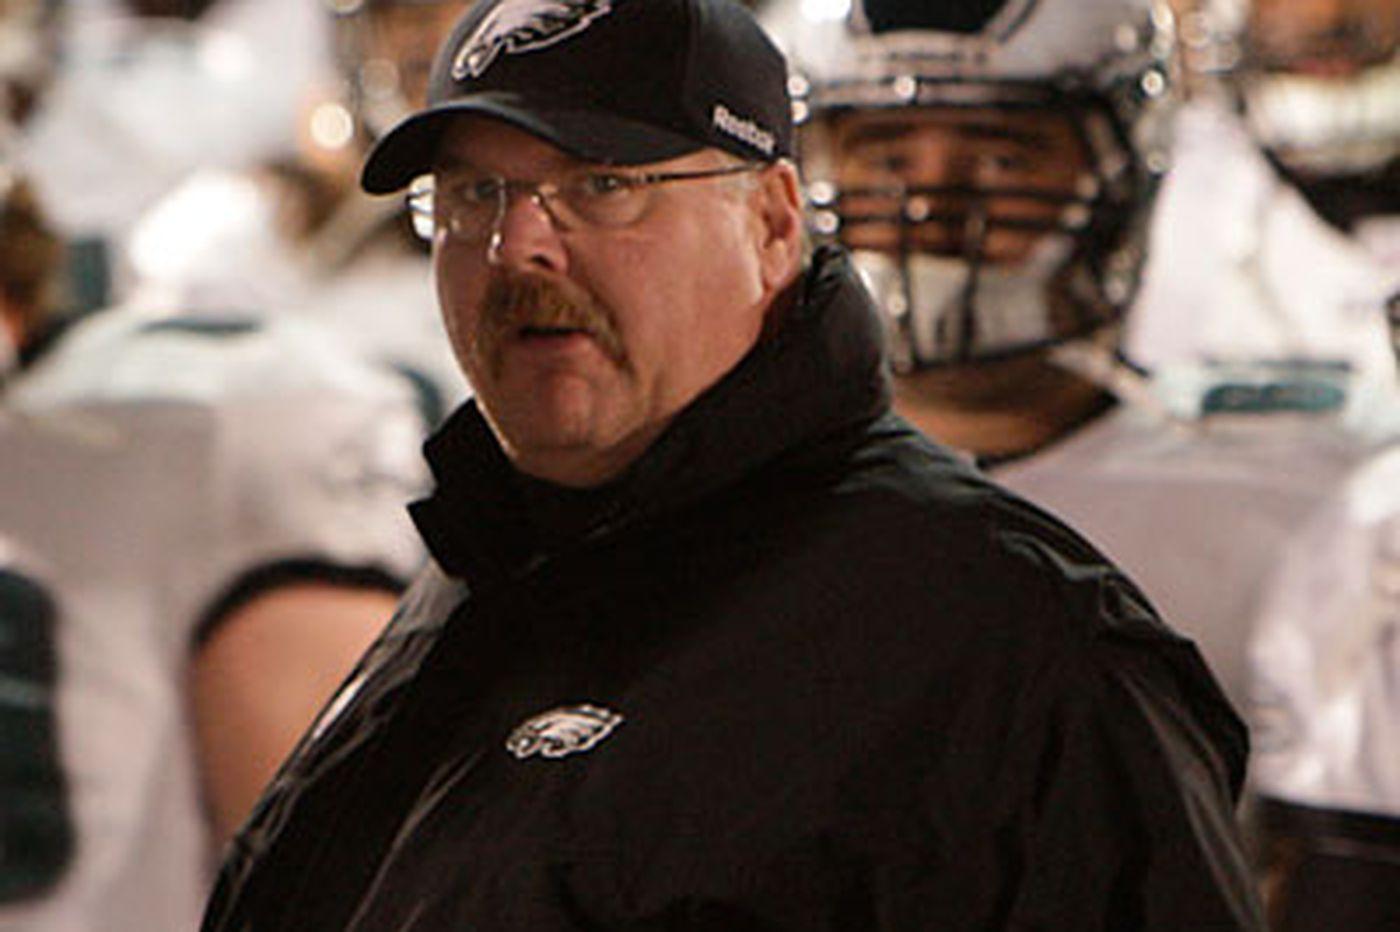 Wanting Eagles to lose remaining games won't accomplish anything